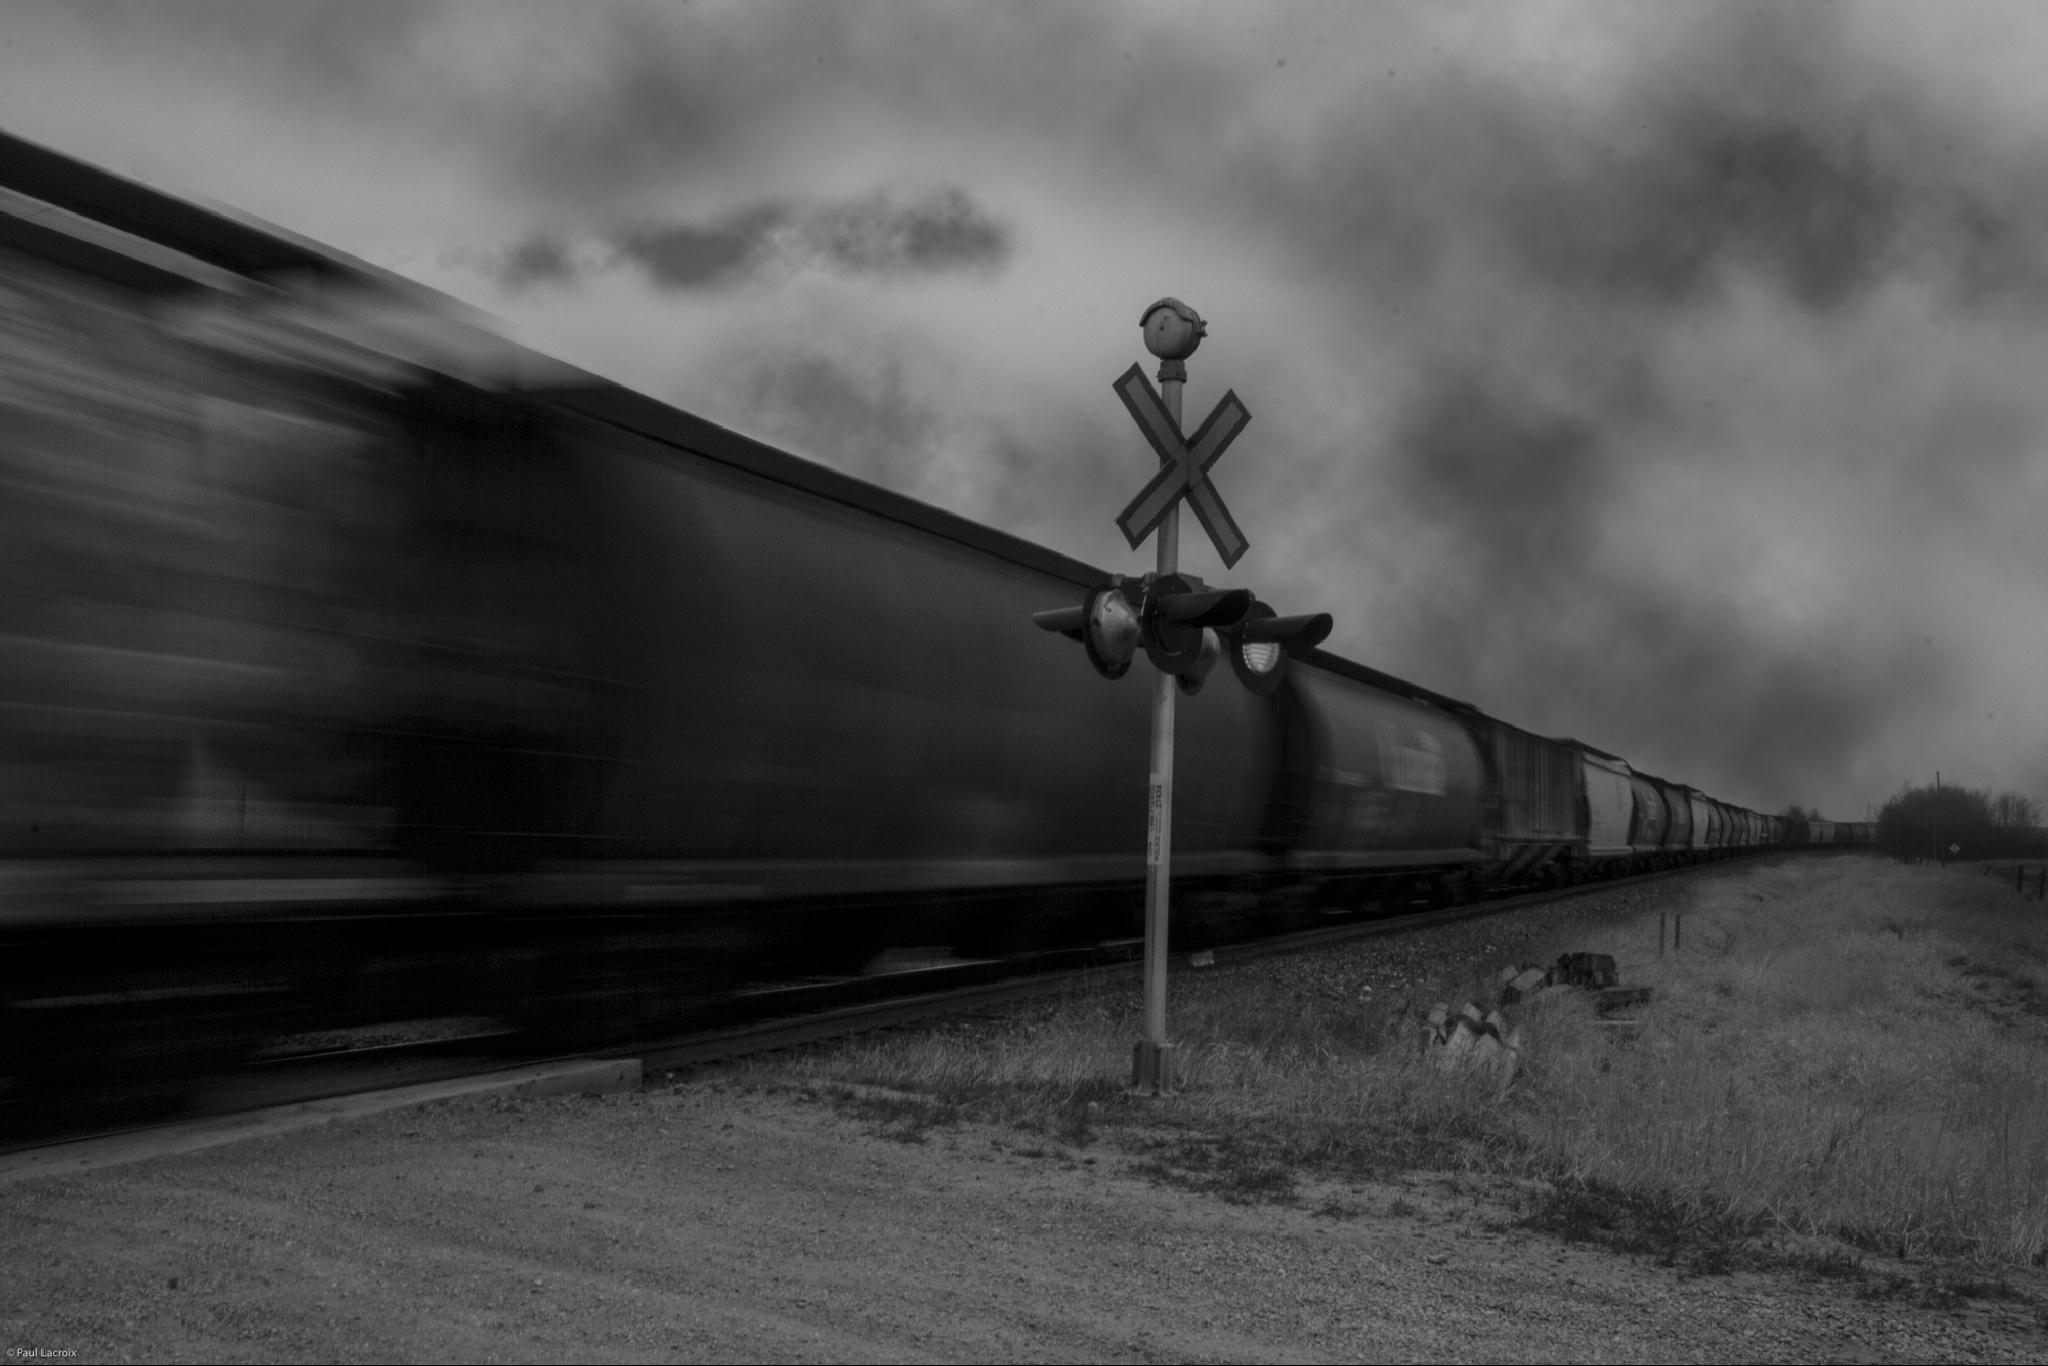 Night train by Paul J Lacroix